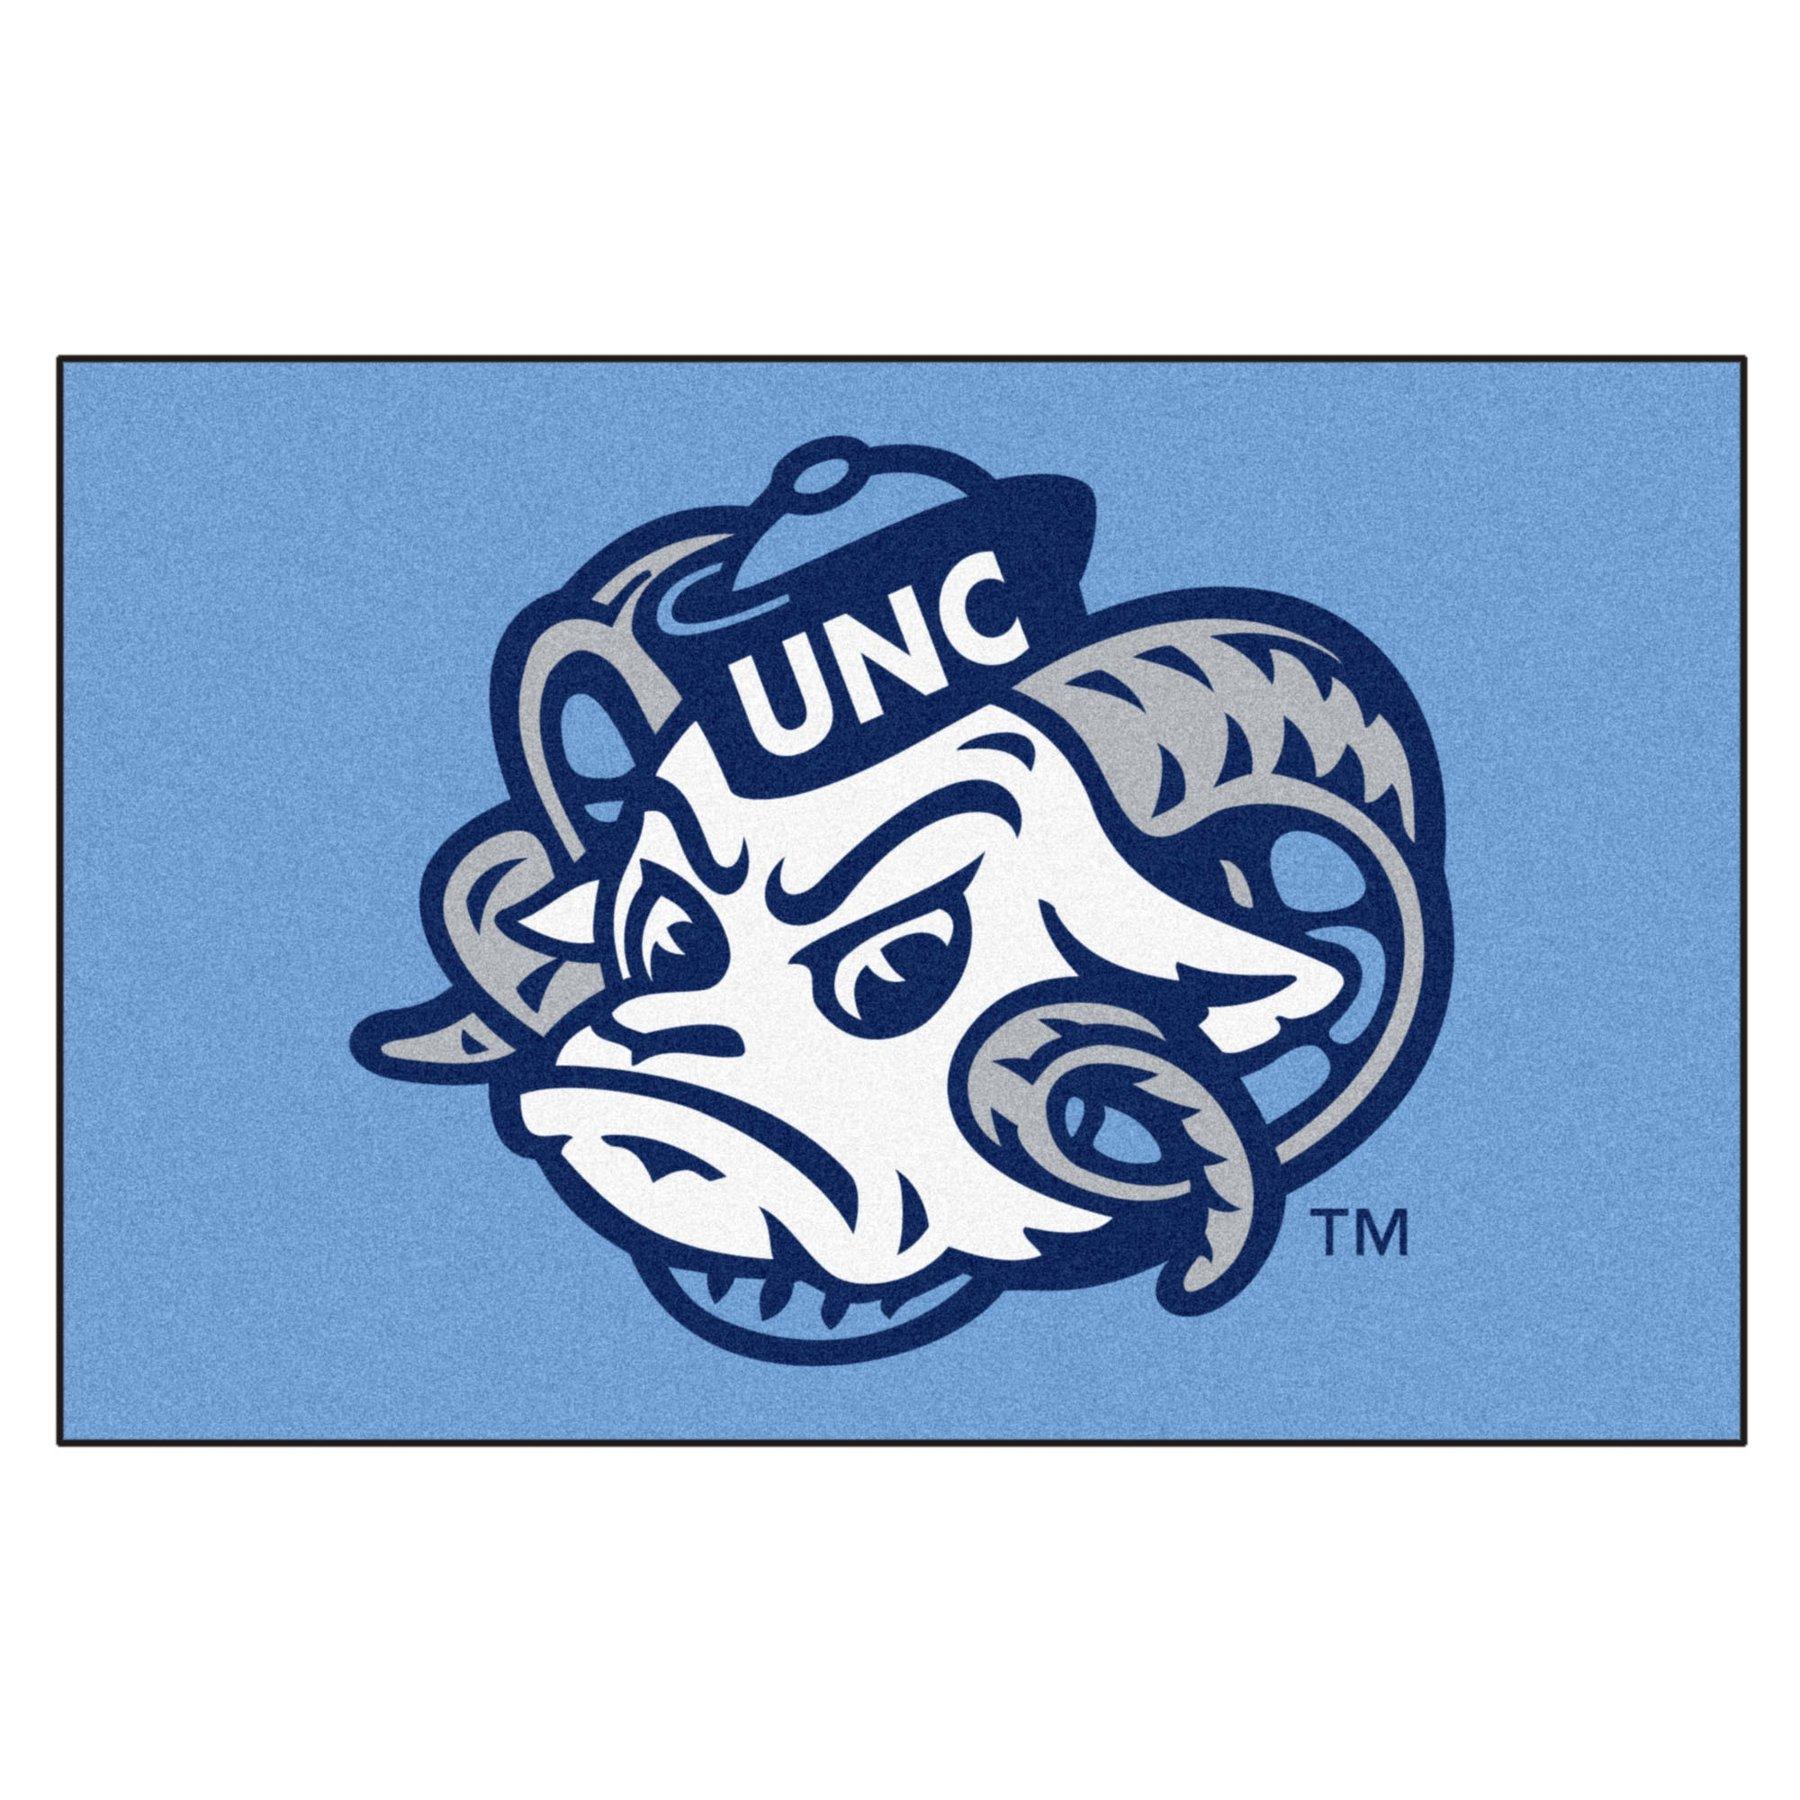 University of North Carolina Tar Heels Logo Area Rug.